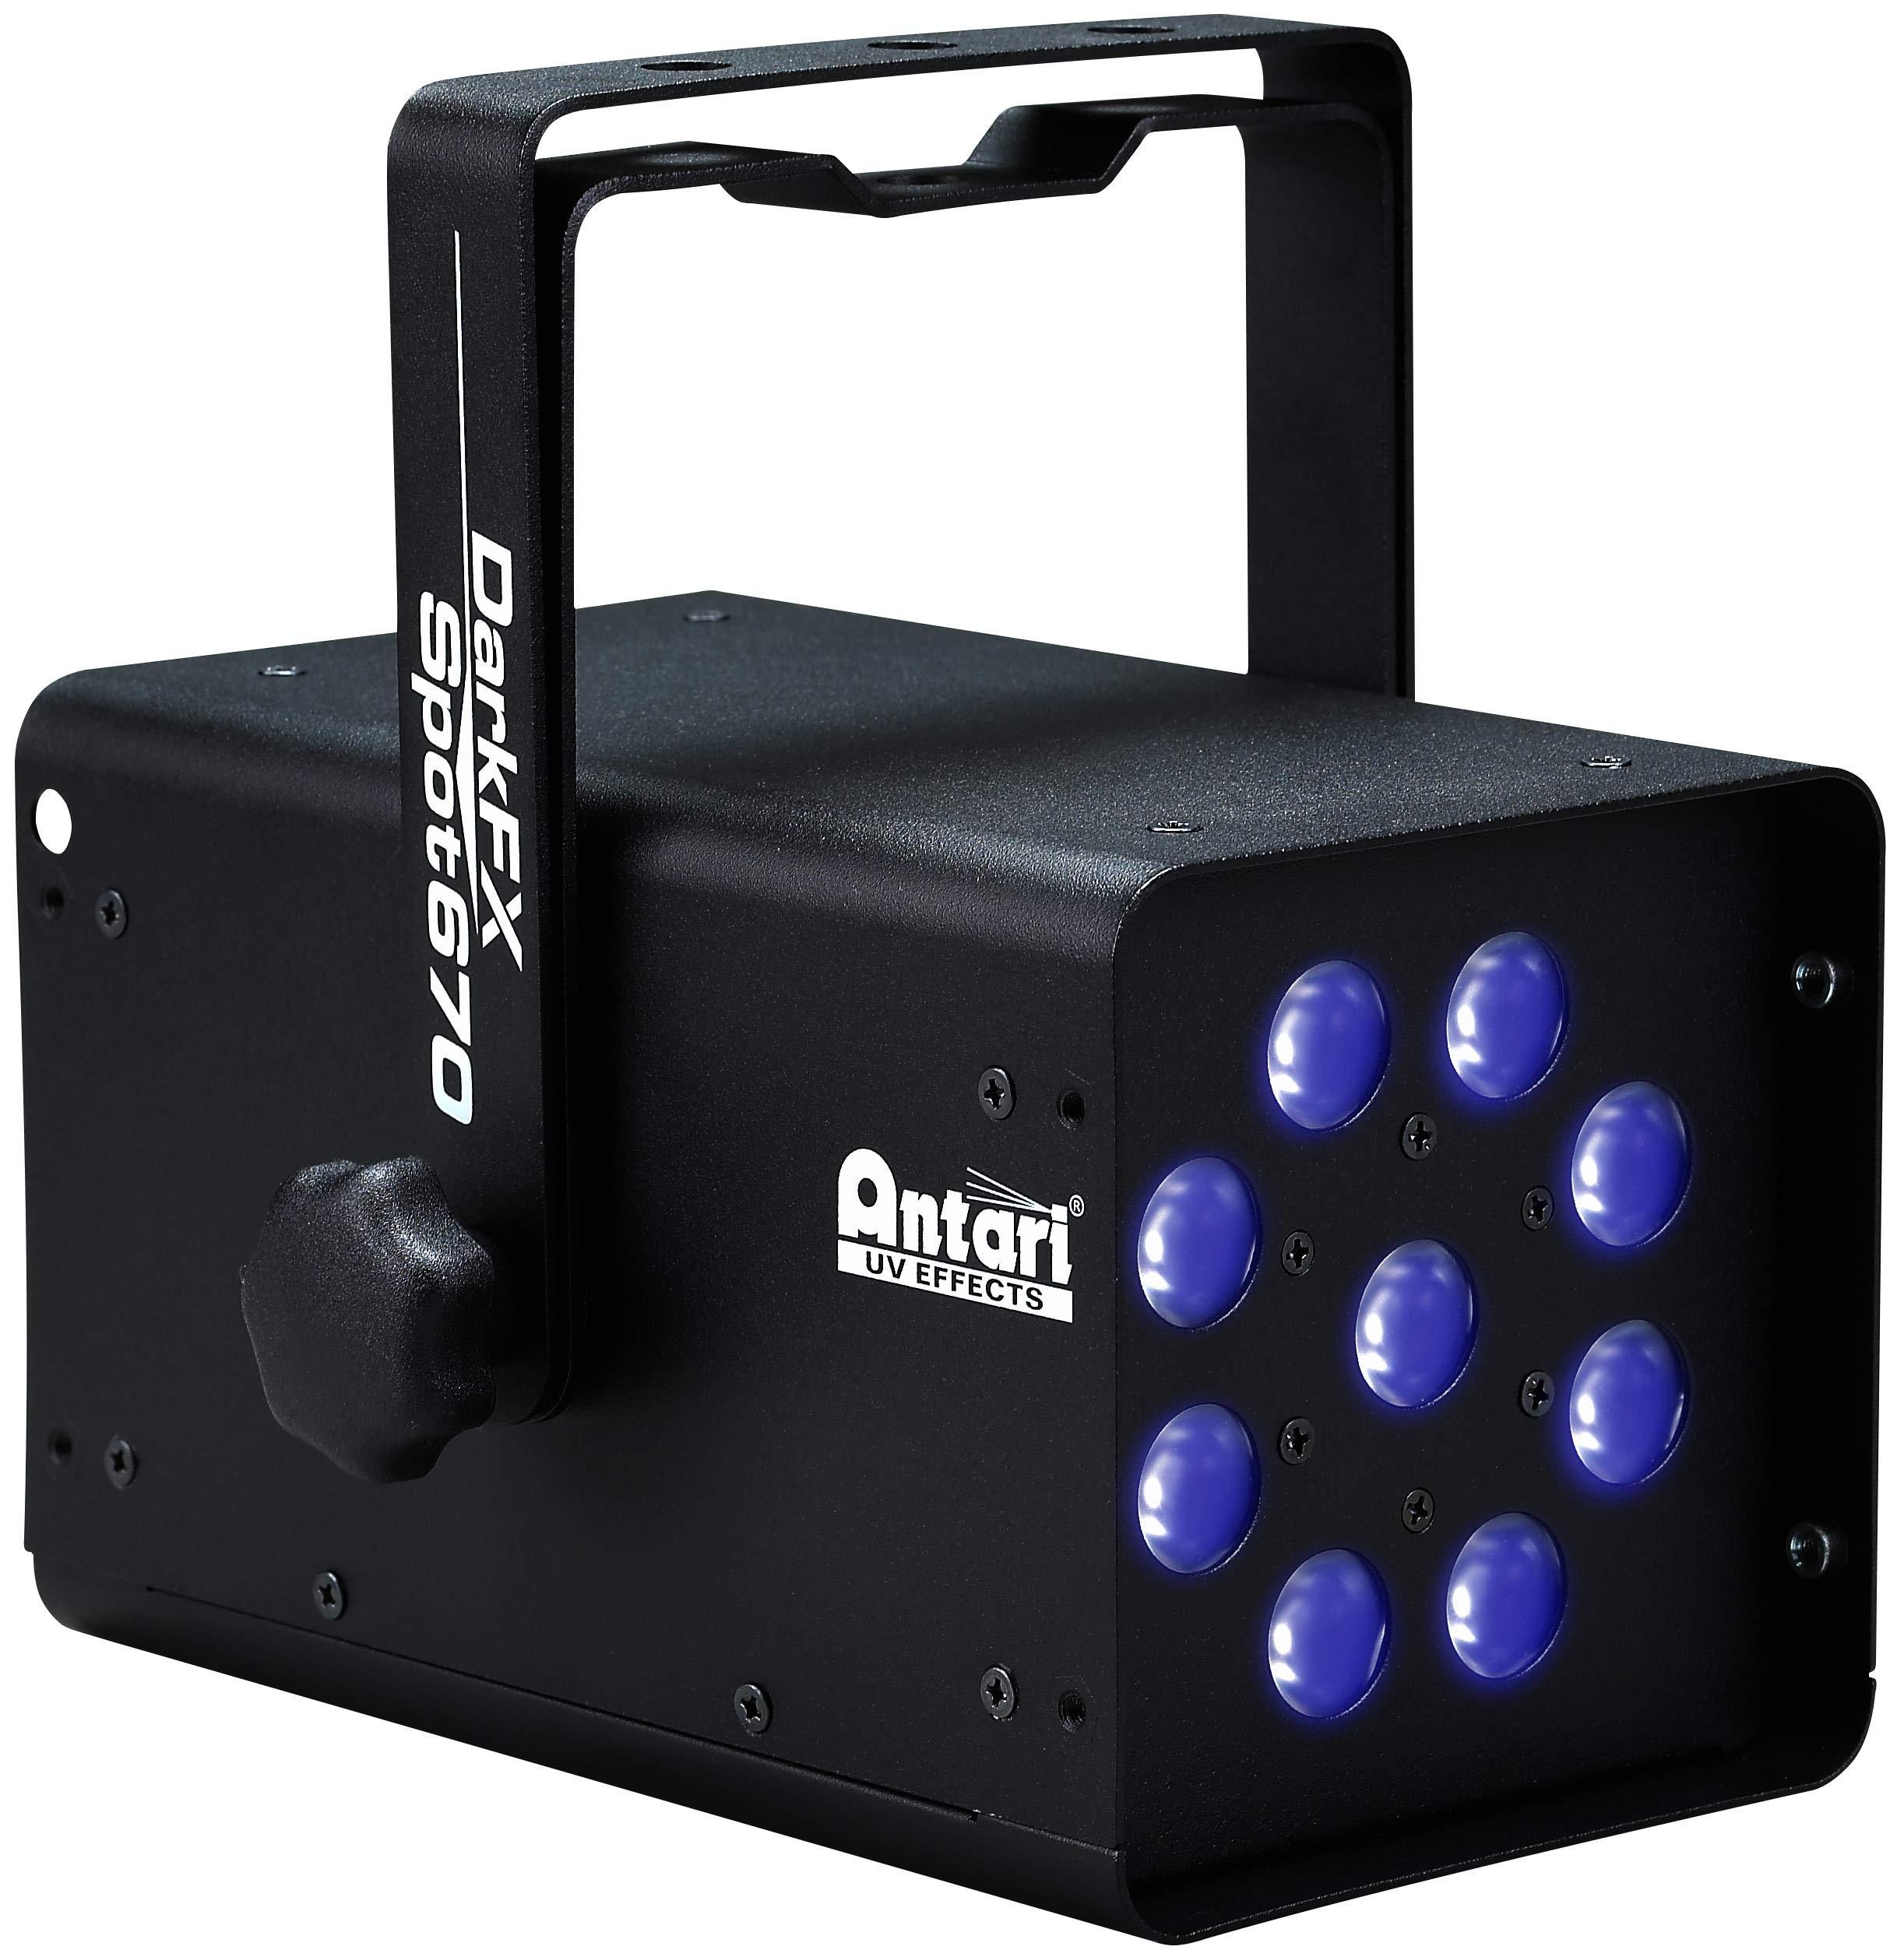 Antari DarkFX S-670 Spot